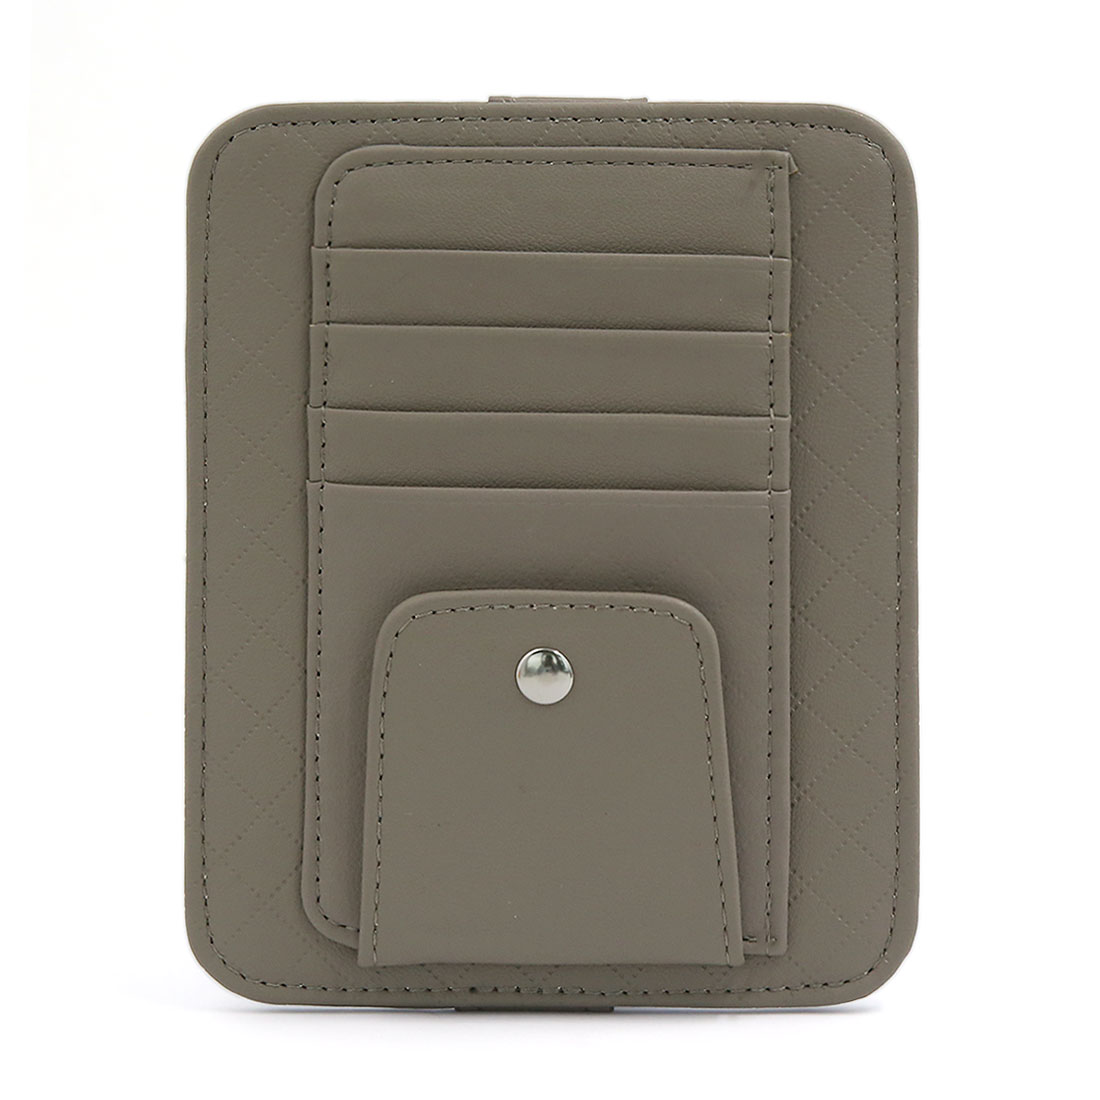 Gray Faux Leather Car Sun Visor Organizer Business Card Storage Case Auto Sunglass Holder